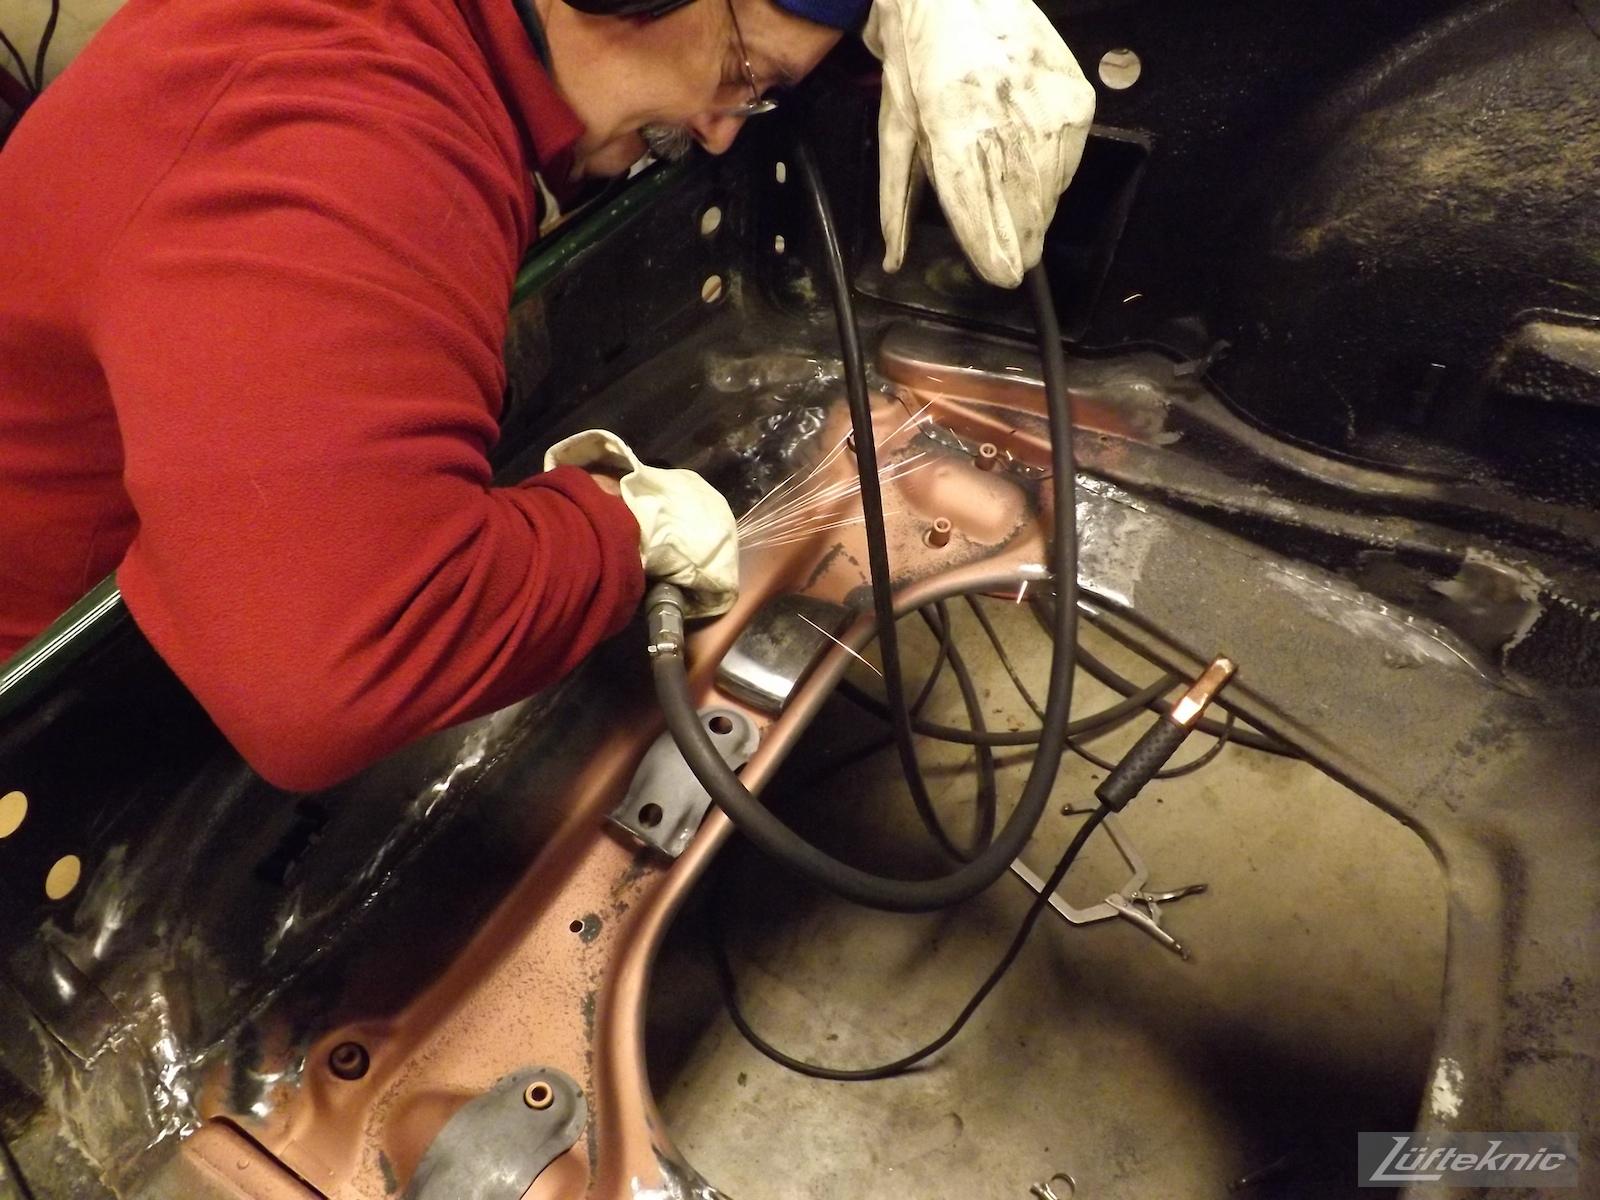 Grinding down welds on an Irish Green Porsche 912 undergoing restoration at Lufteknic.